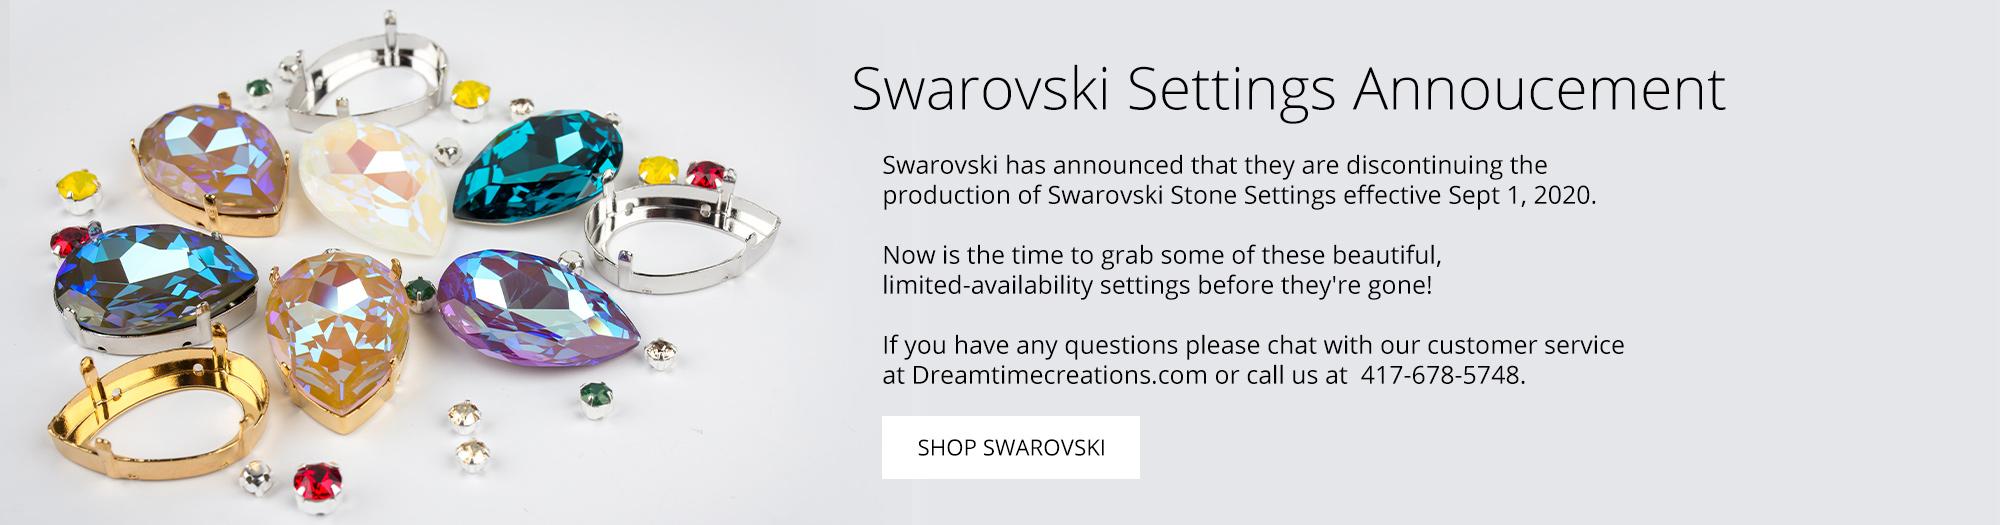 Swarovski Settings Announcement